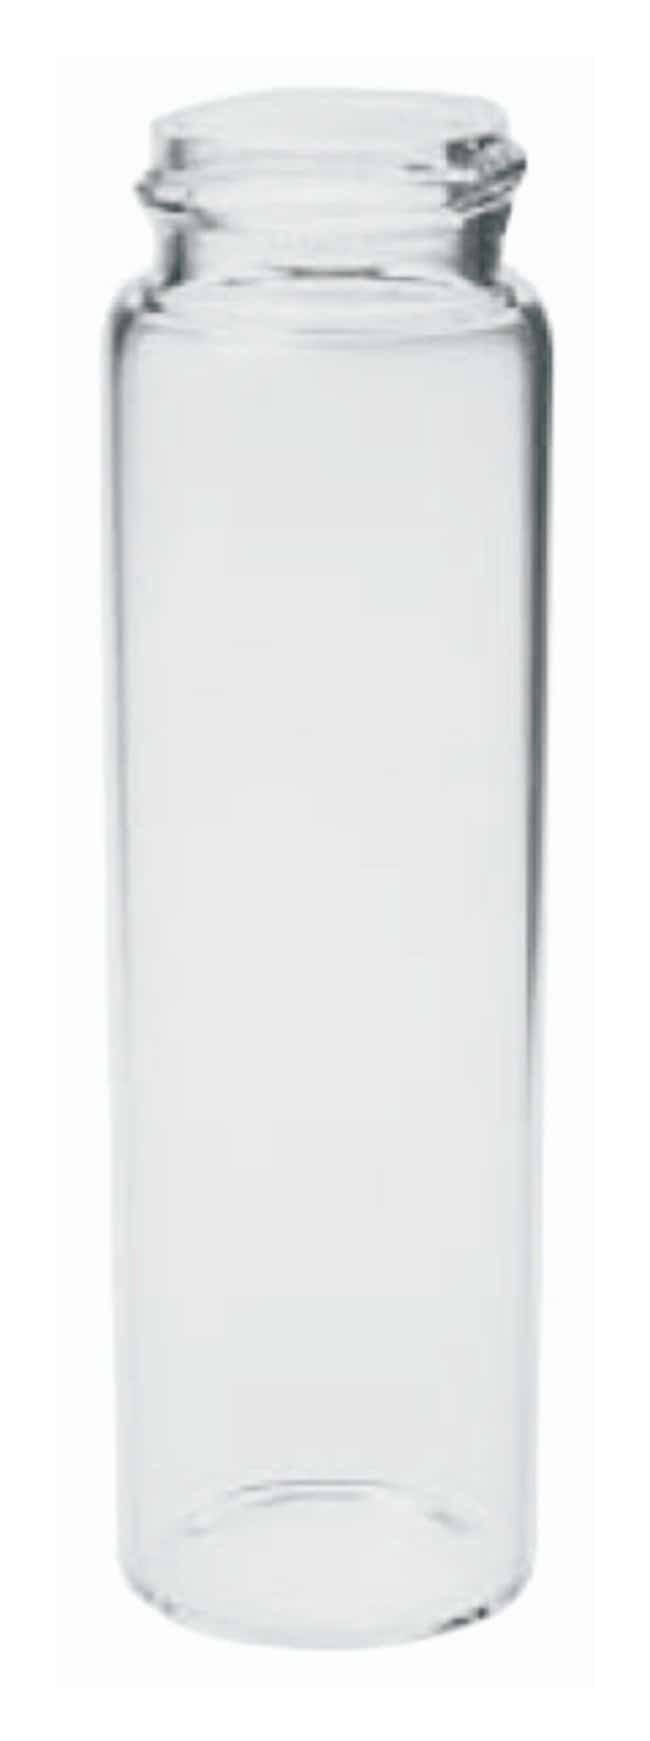 DWK Life SciencesKimble™ Glass Vials for EPA Water Analysis Clear KG-33 Borosilicate Glass; For EPA Water Analysis 30mL DWK Life SciencesKimble™ Glass Vials for EPA Water Analysis